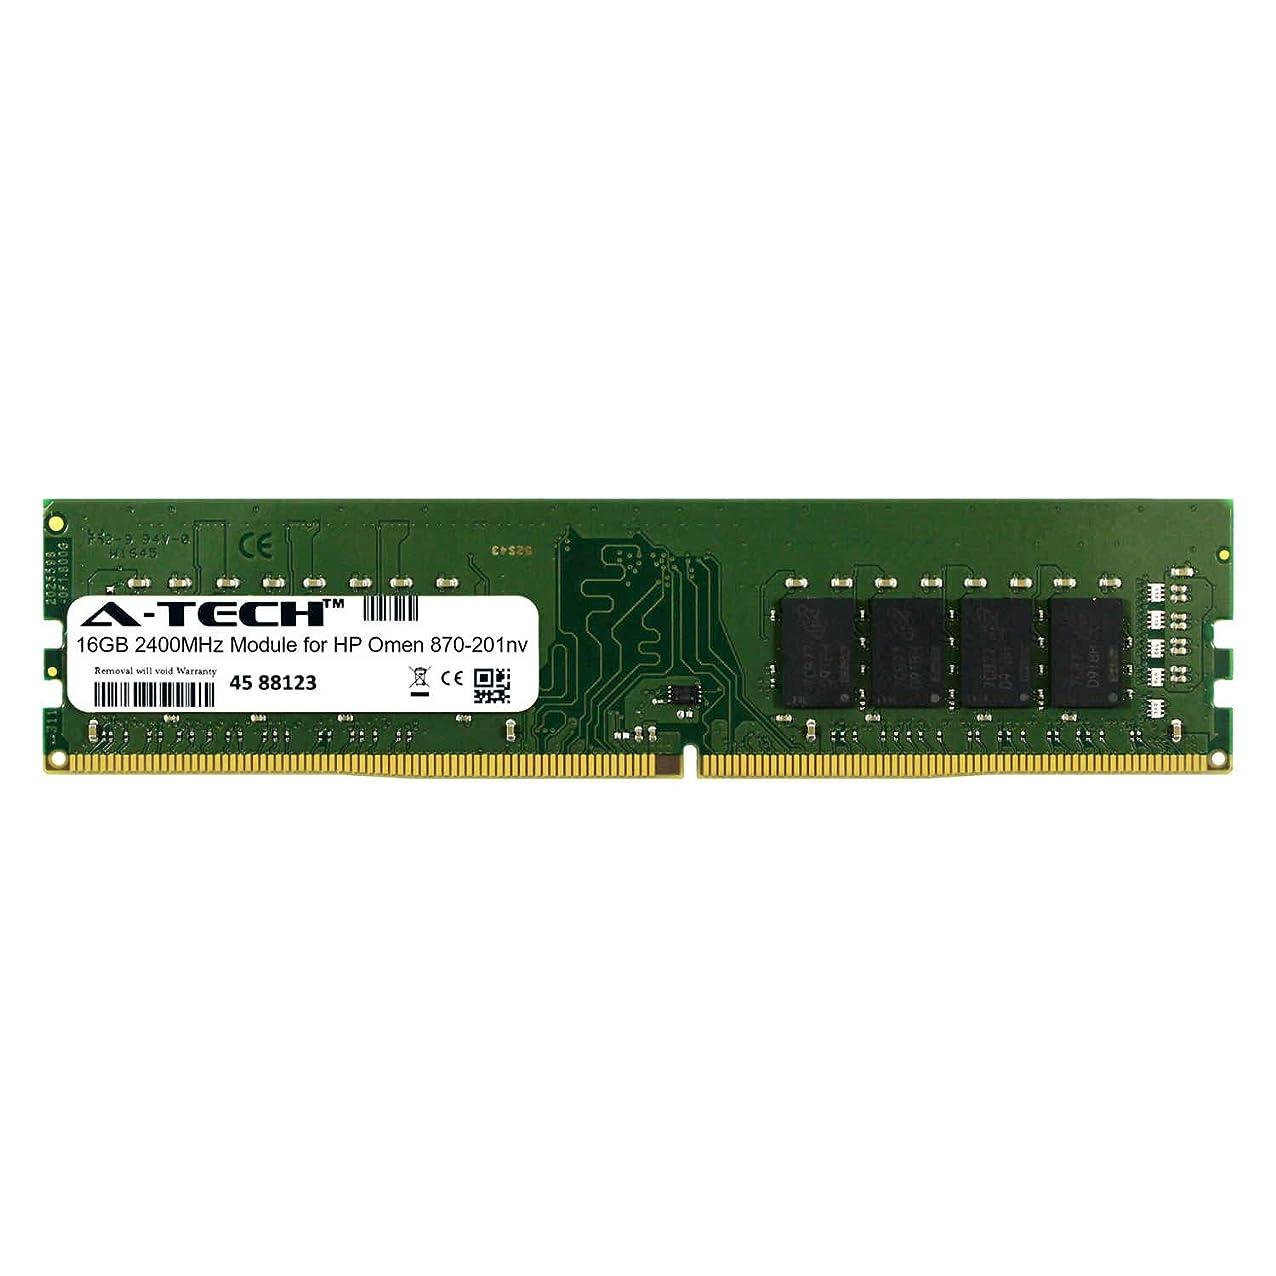 A-Tech 16GB Module for HP Omen 870-201nv Desktop & Workstation Motherboard Compatible DDR4 2400Mhz Memory Ram (ATMS282219A25822X1) ymubphdsrsruq519